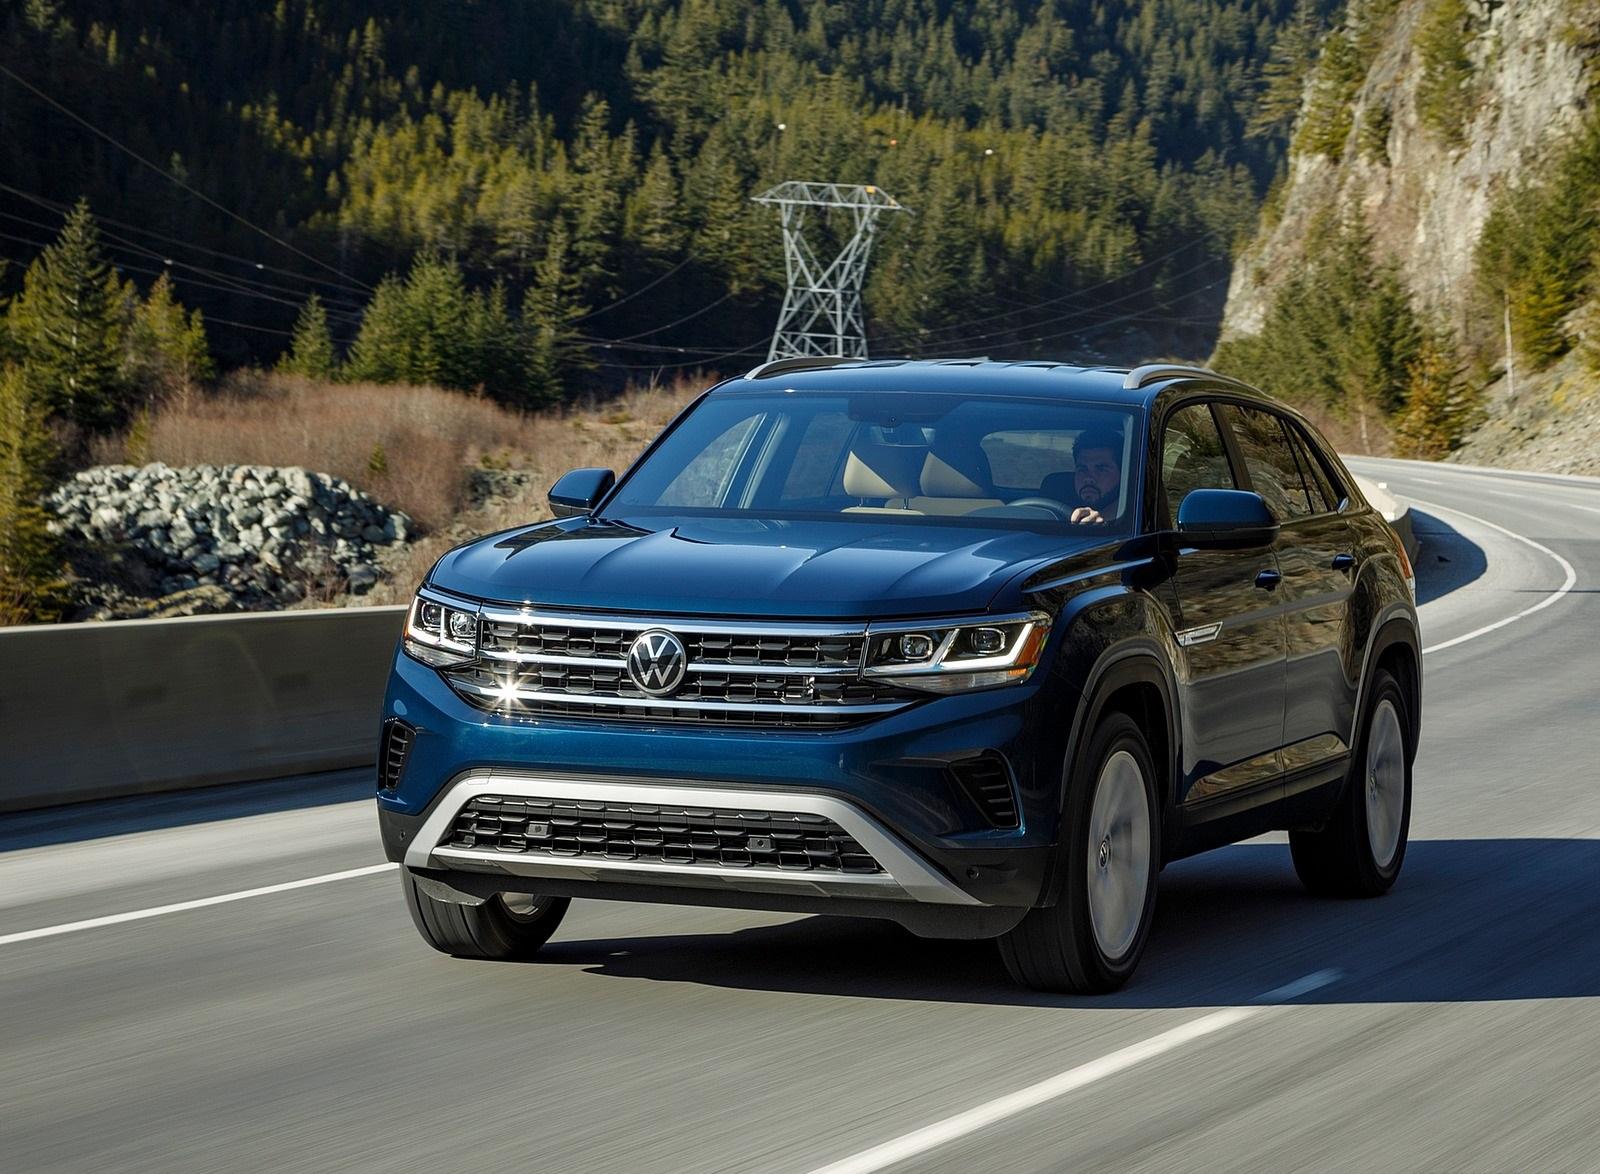 2020 Volkswagen Atlas Cross Sport Se Wallpapers 24 Hd Images Newcarcars